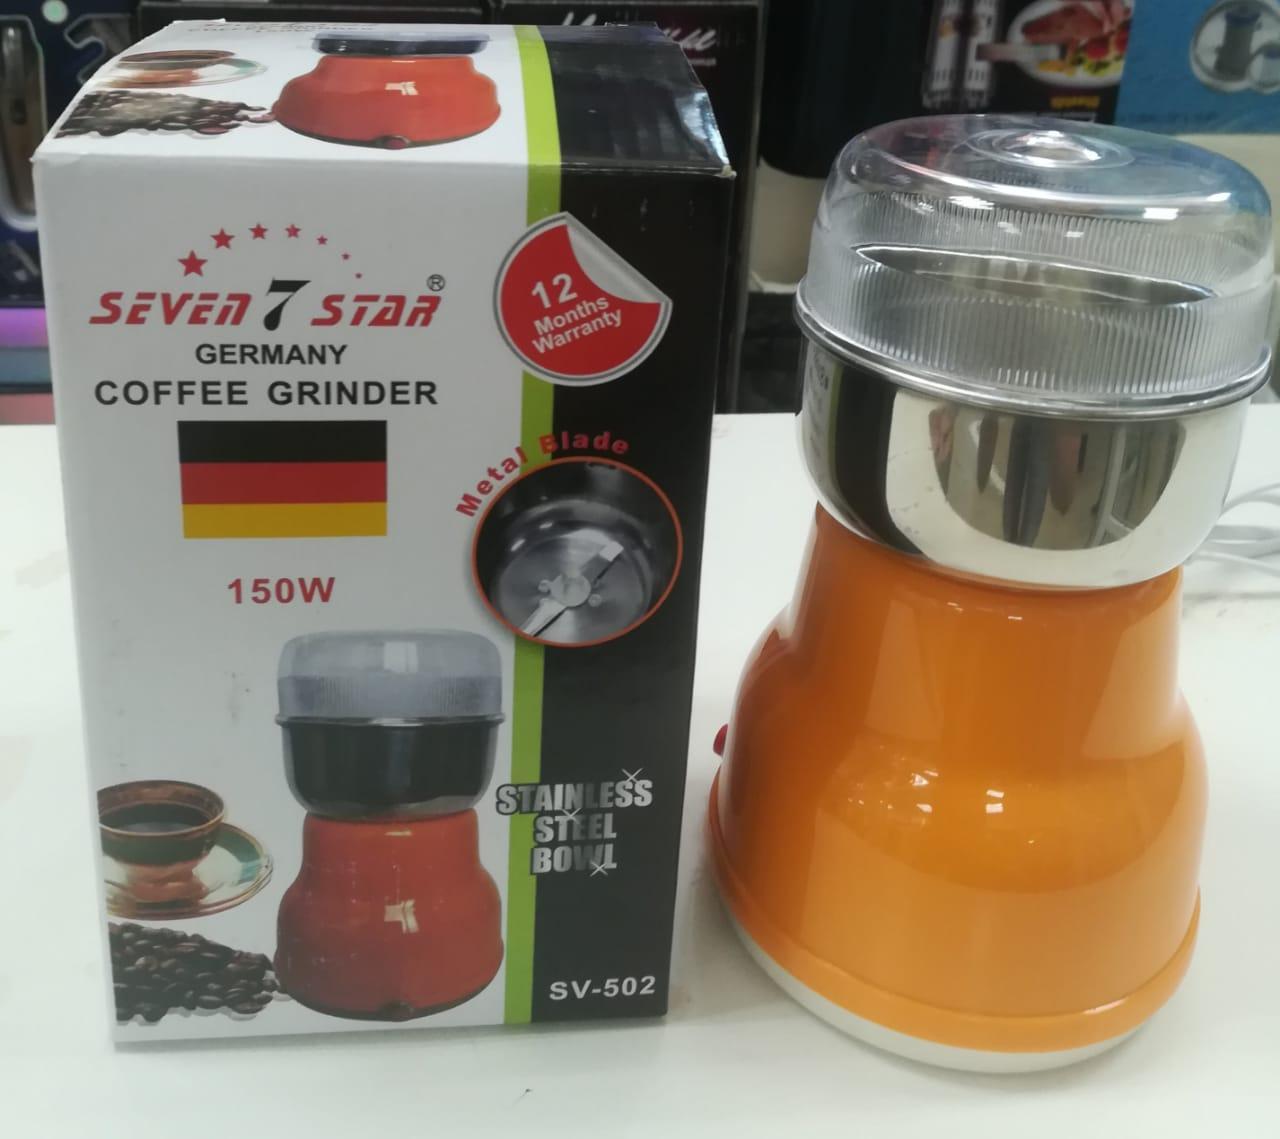 Кофемолка Seven Star